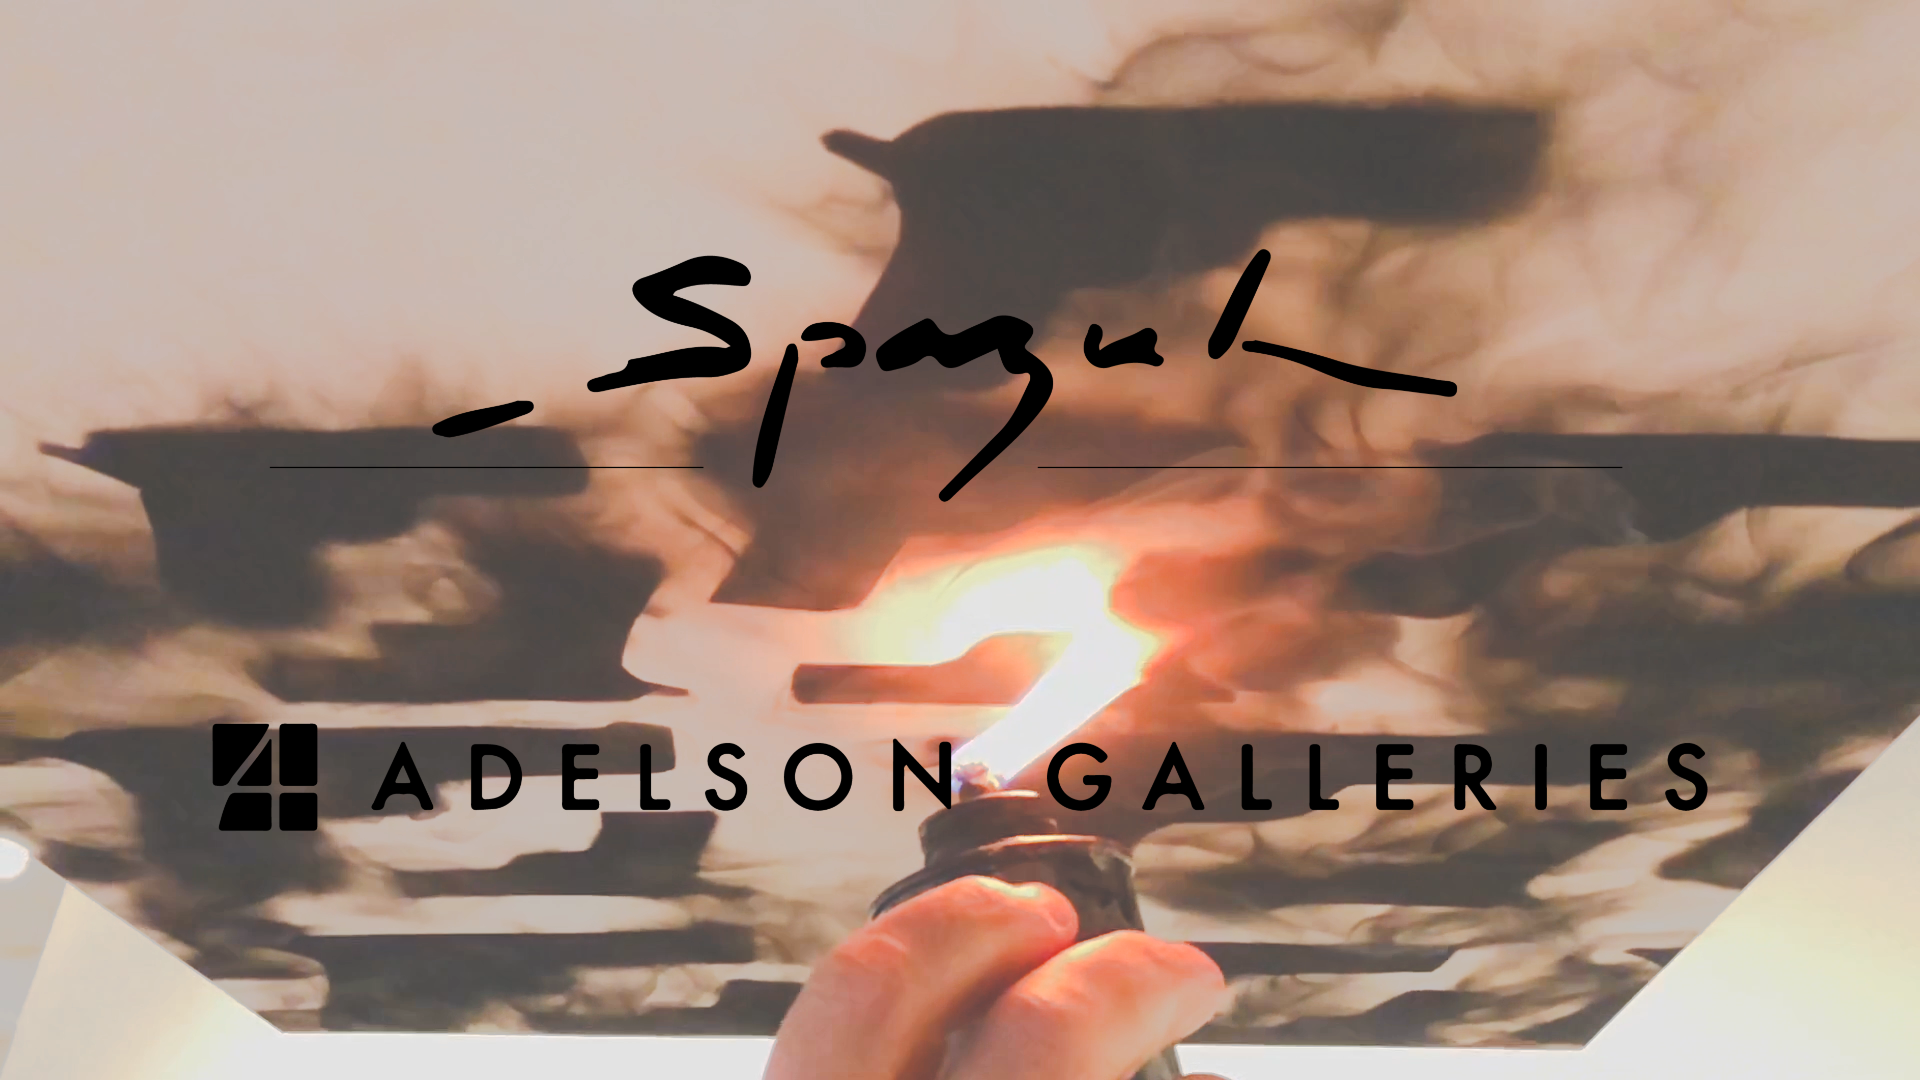 Steven Spazuk, Adelson Galleries. Camera, Edit 2018